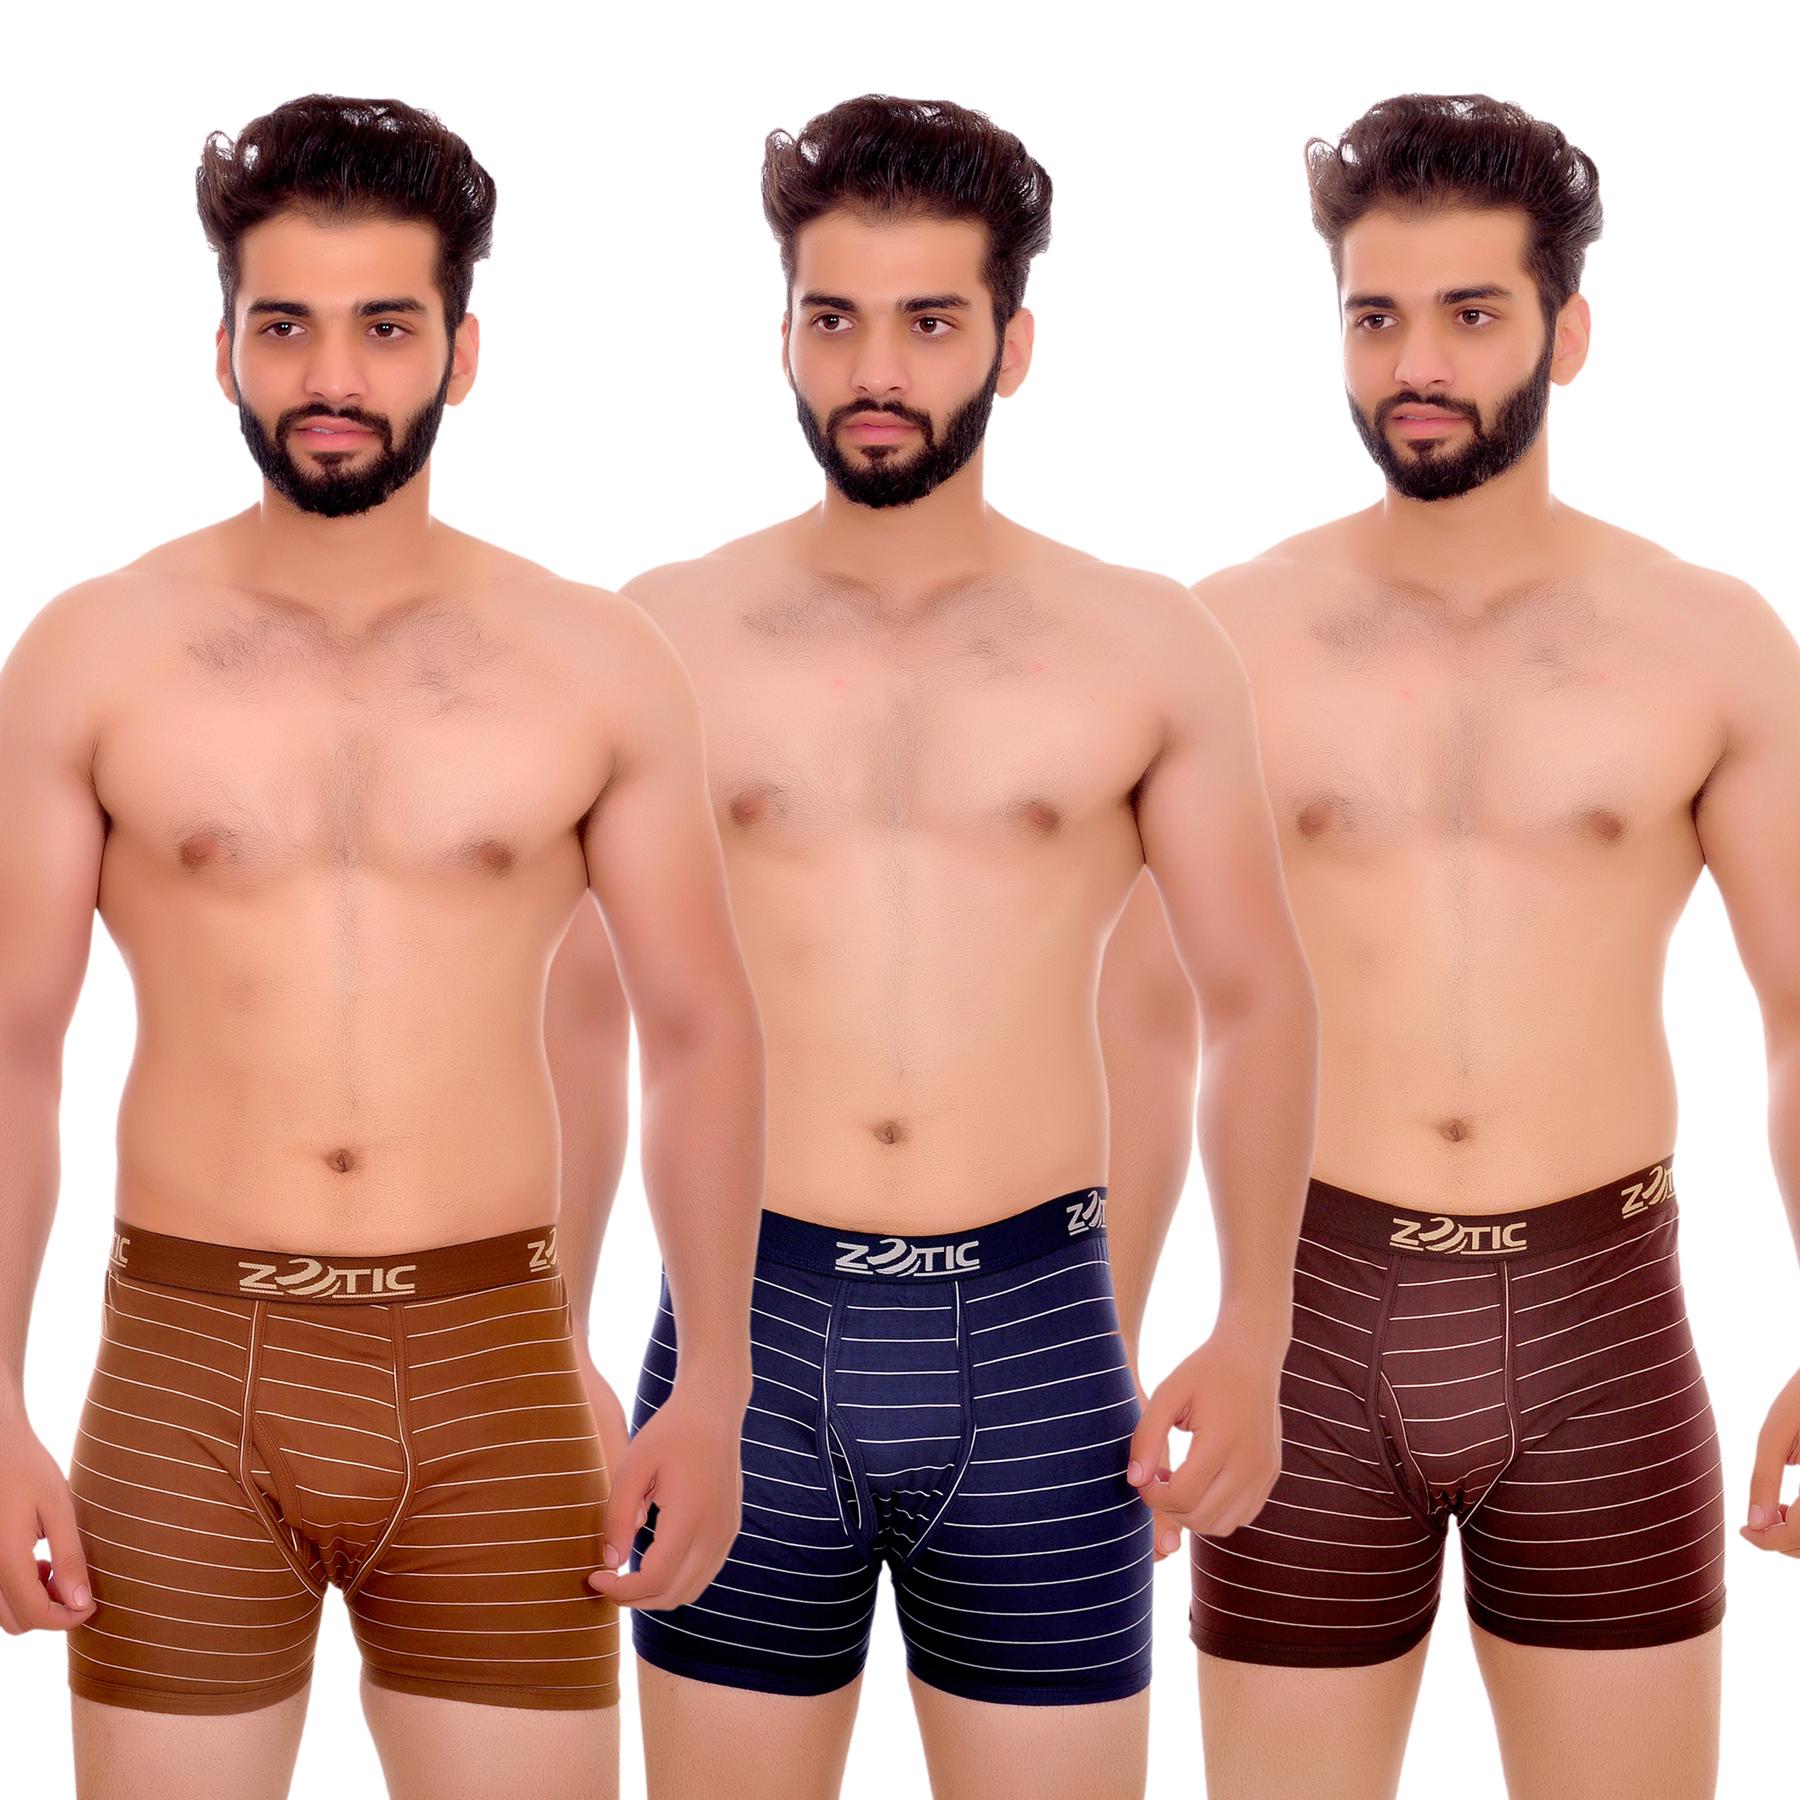 Zotic Men's Trunk'H' Underwear ST01   Pack Of 3